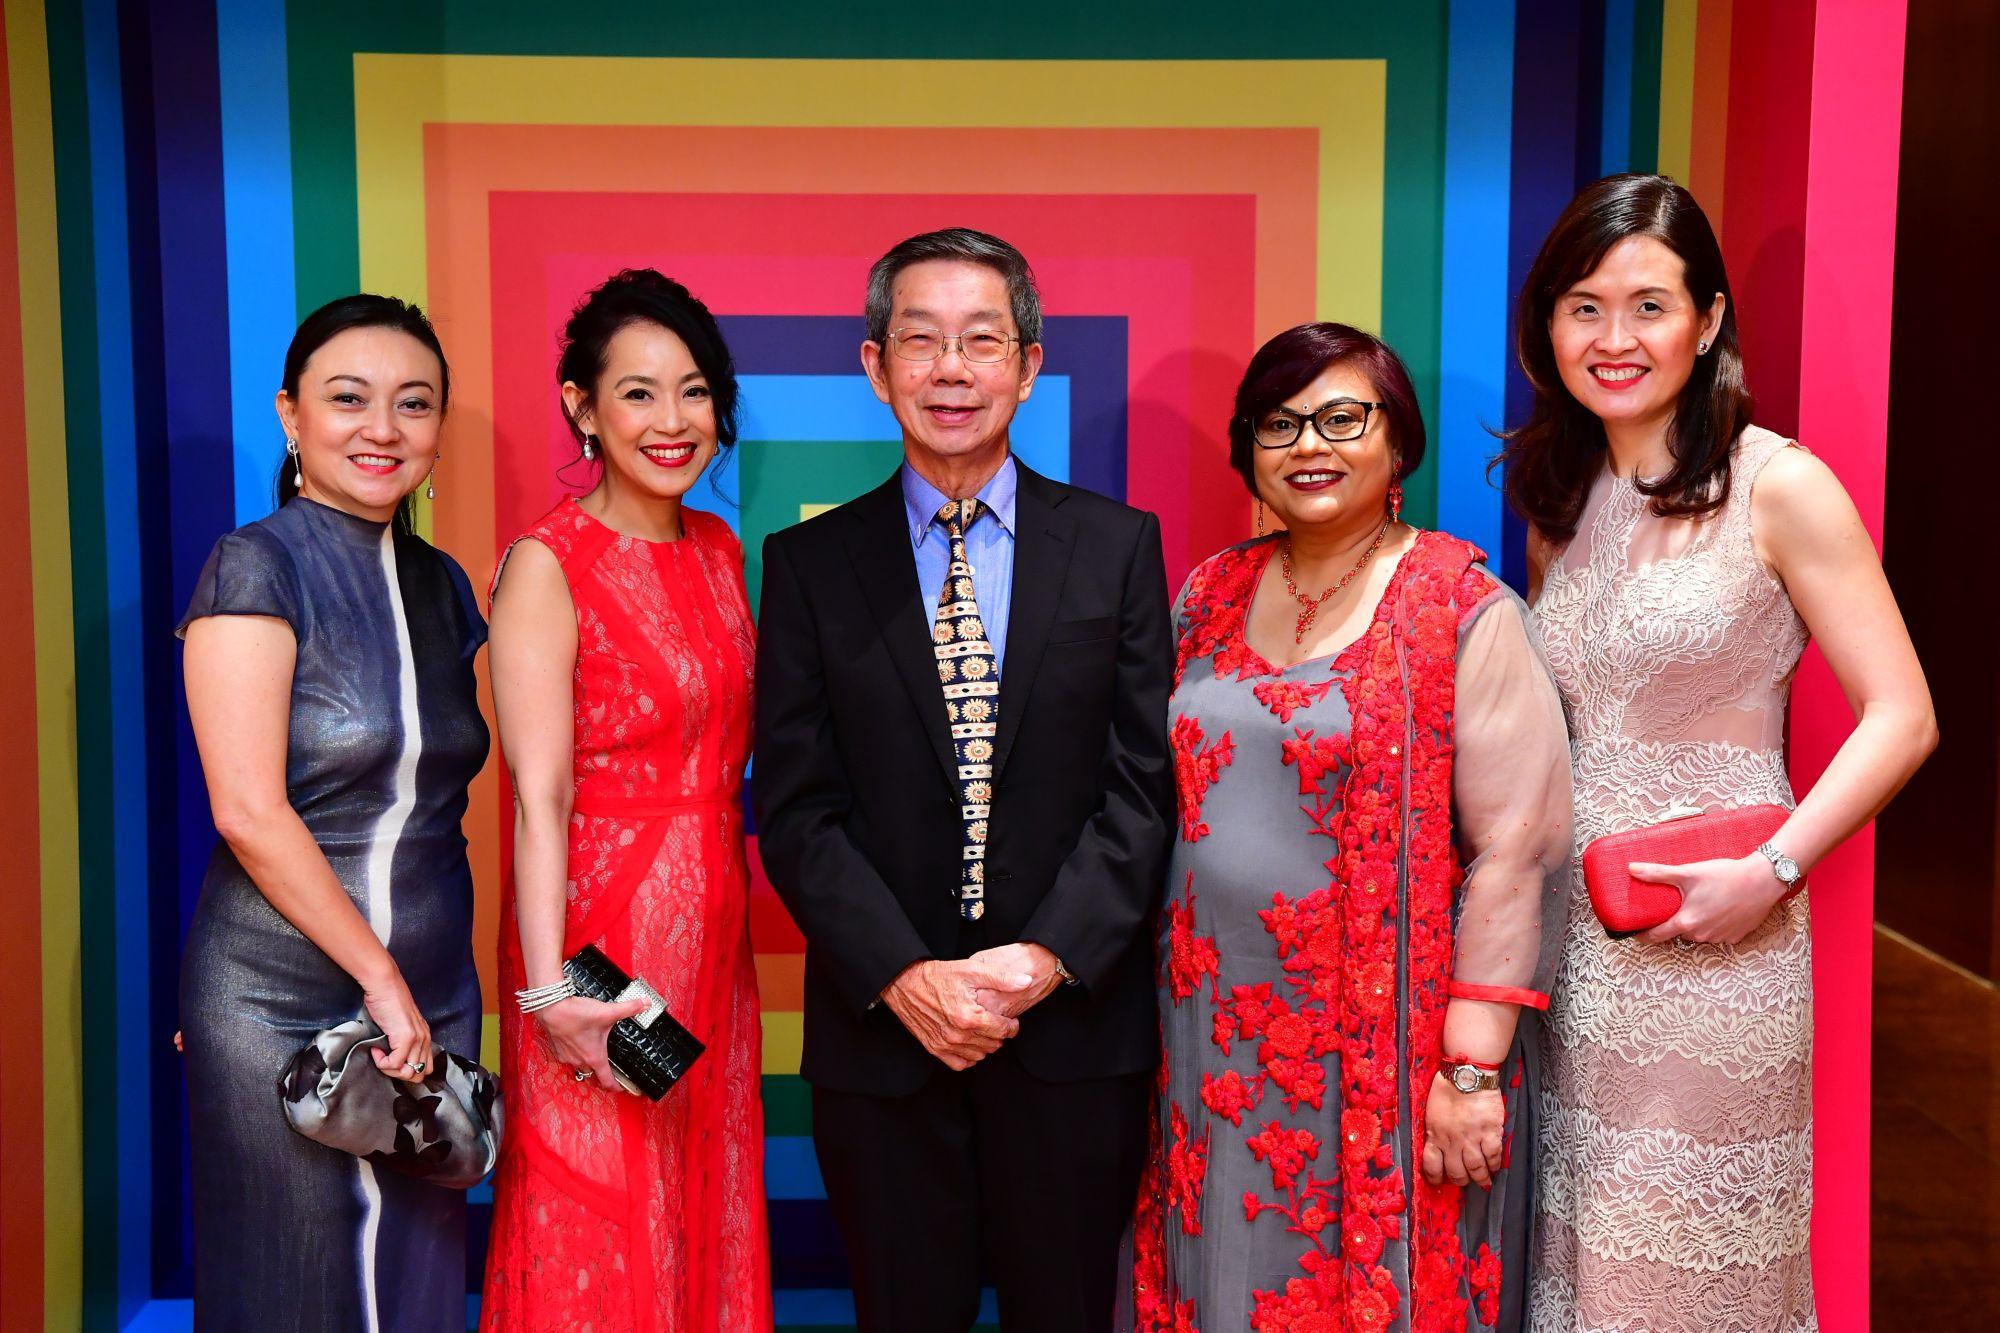 Goh Shuet-Li, Jennifer Chia, Heng Chiang Meng, Jamuna Rani Govindaraju, Audrey Looi